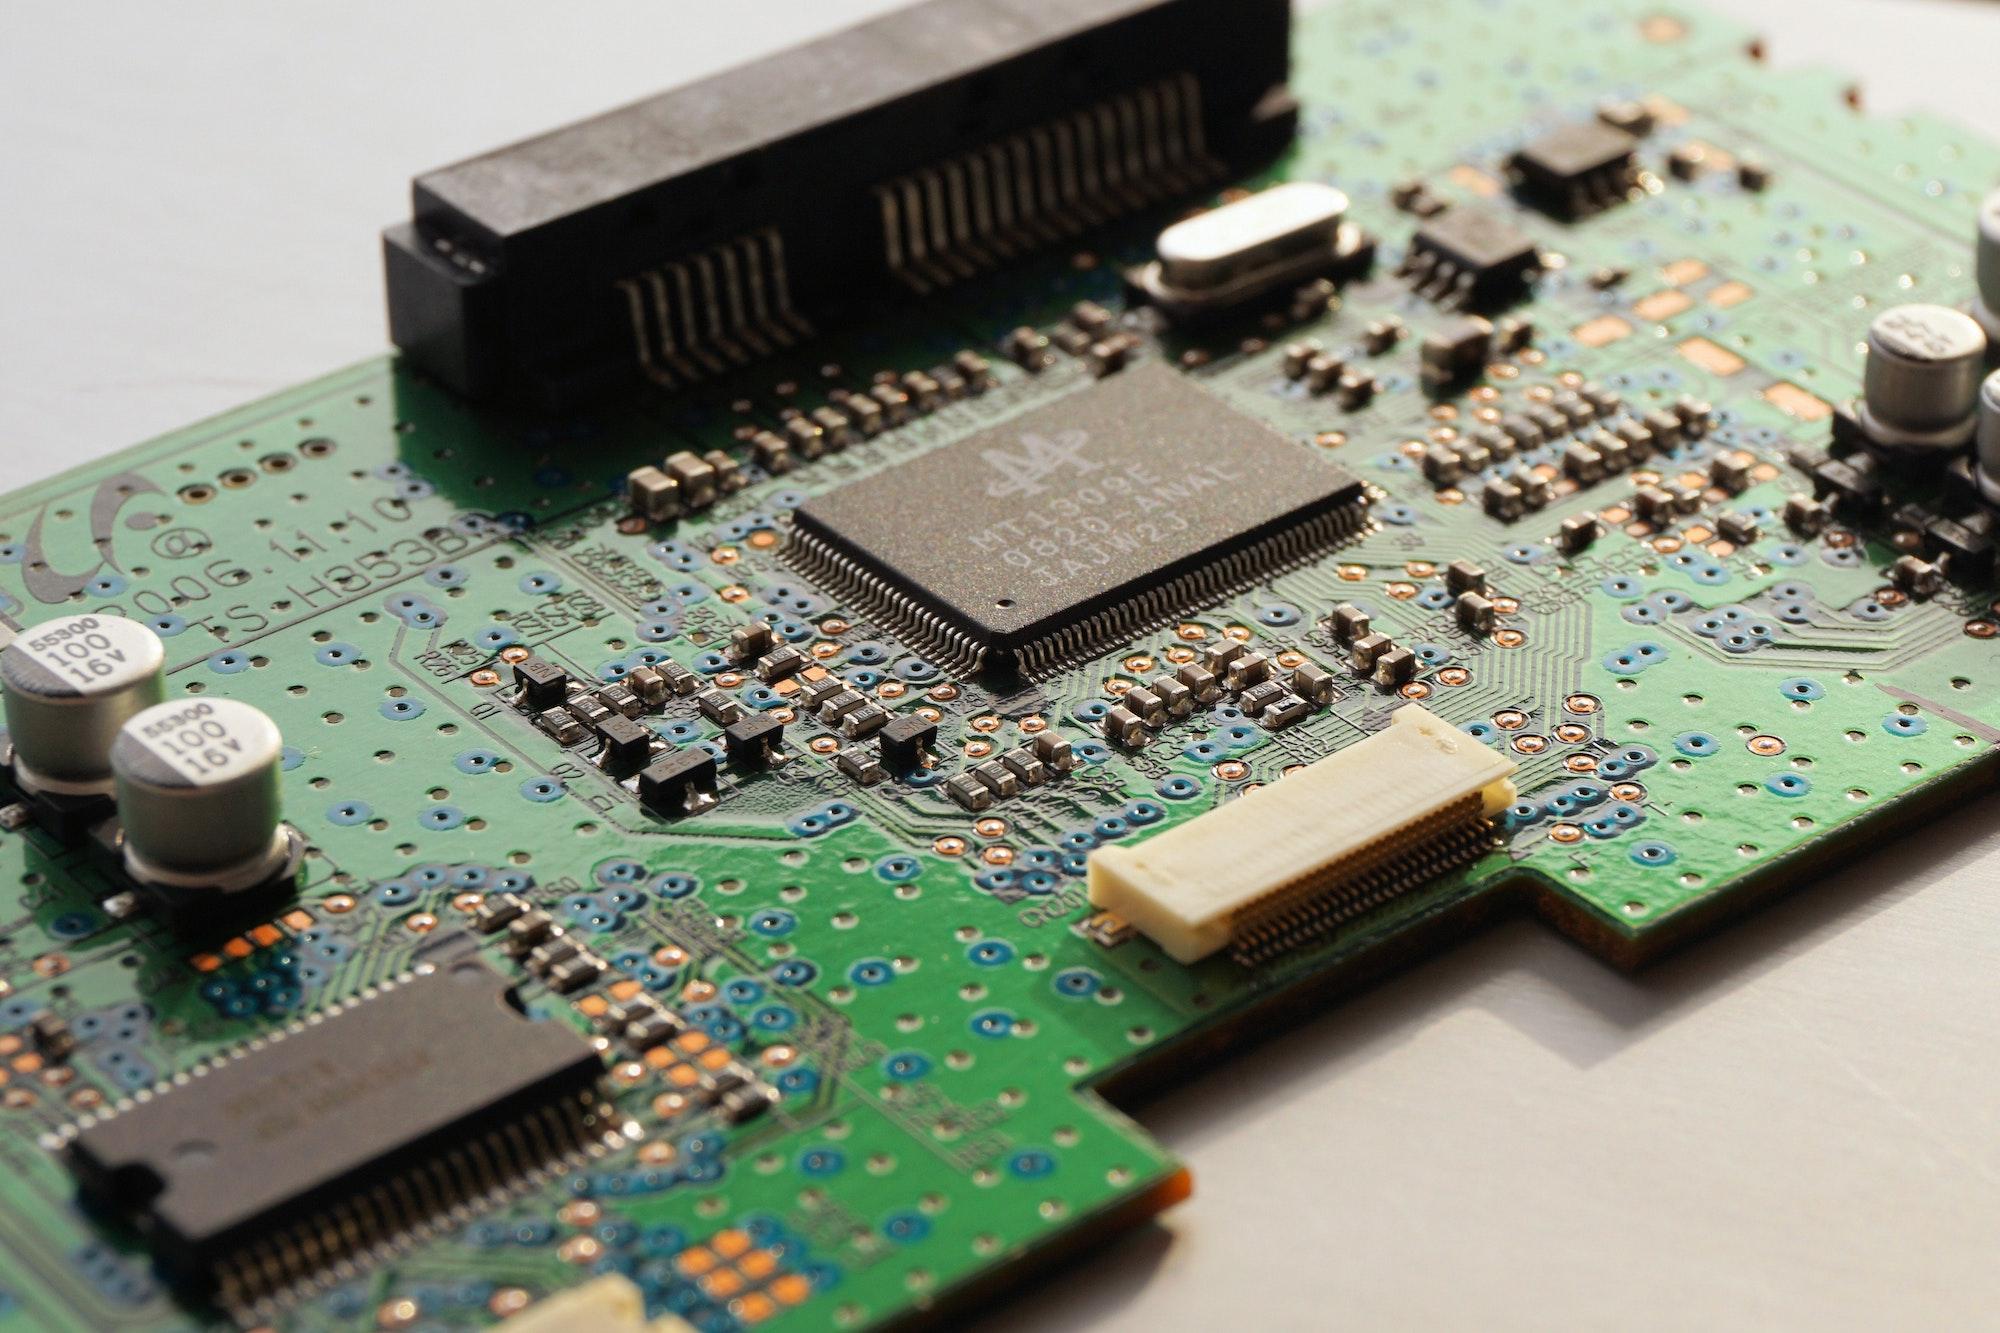 board-chip-circuits-163170.jpg